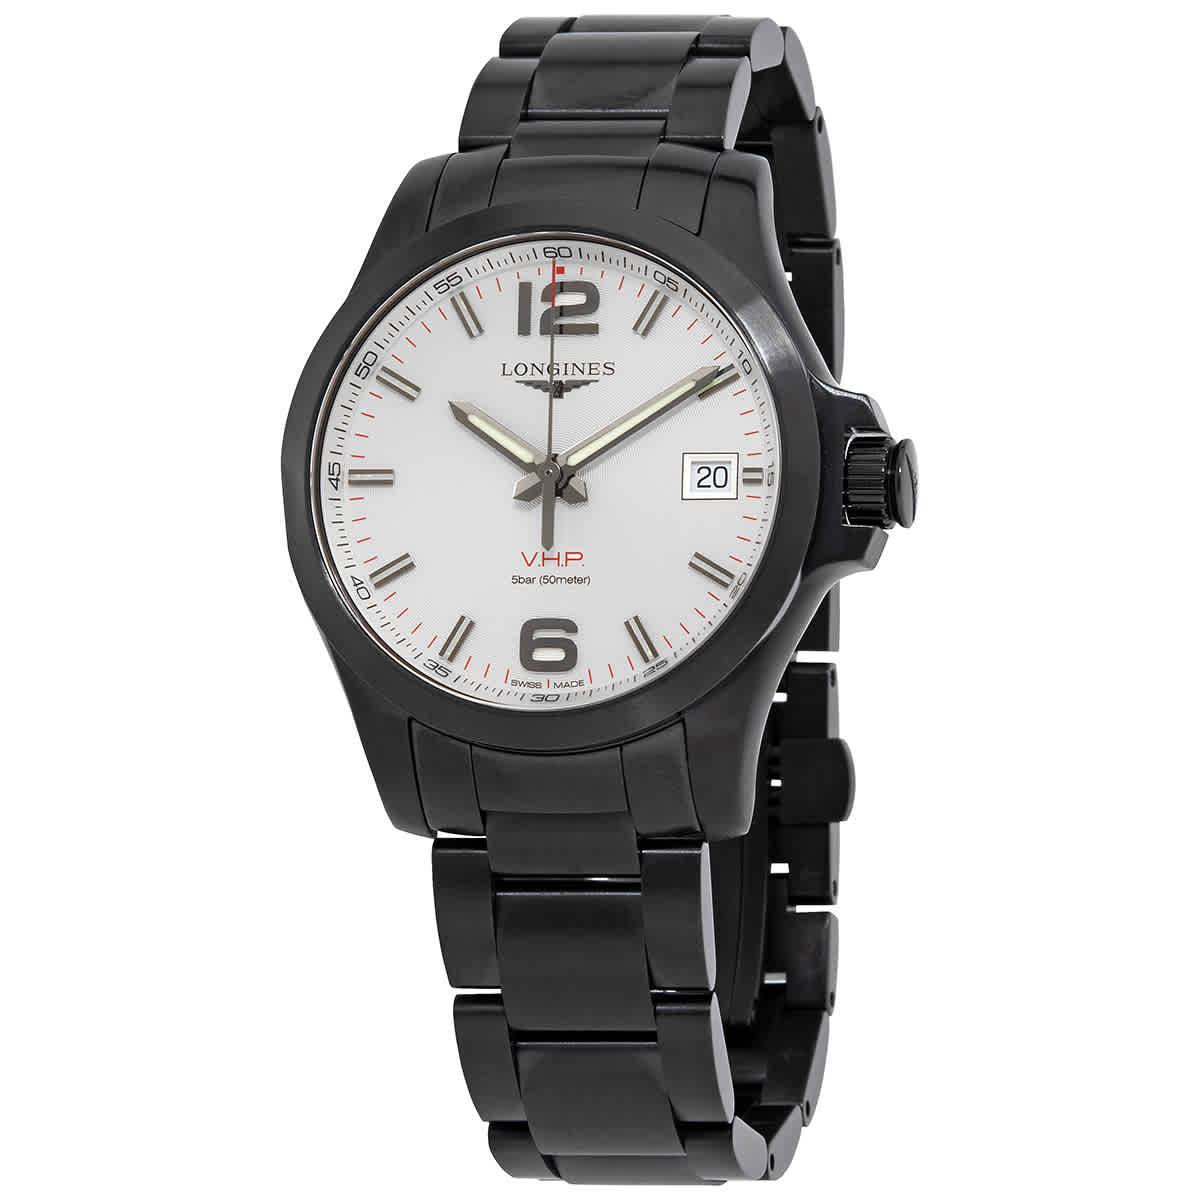 Longines Conquest V.h.p. Quartz Silver Dial Mens Watch L3.716.2.76.6 In Black,silver Tone